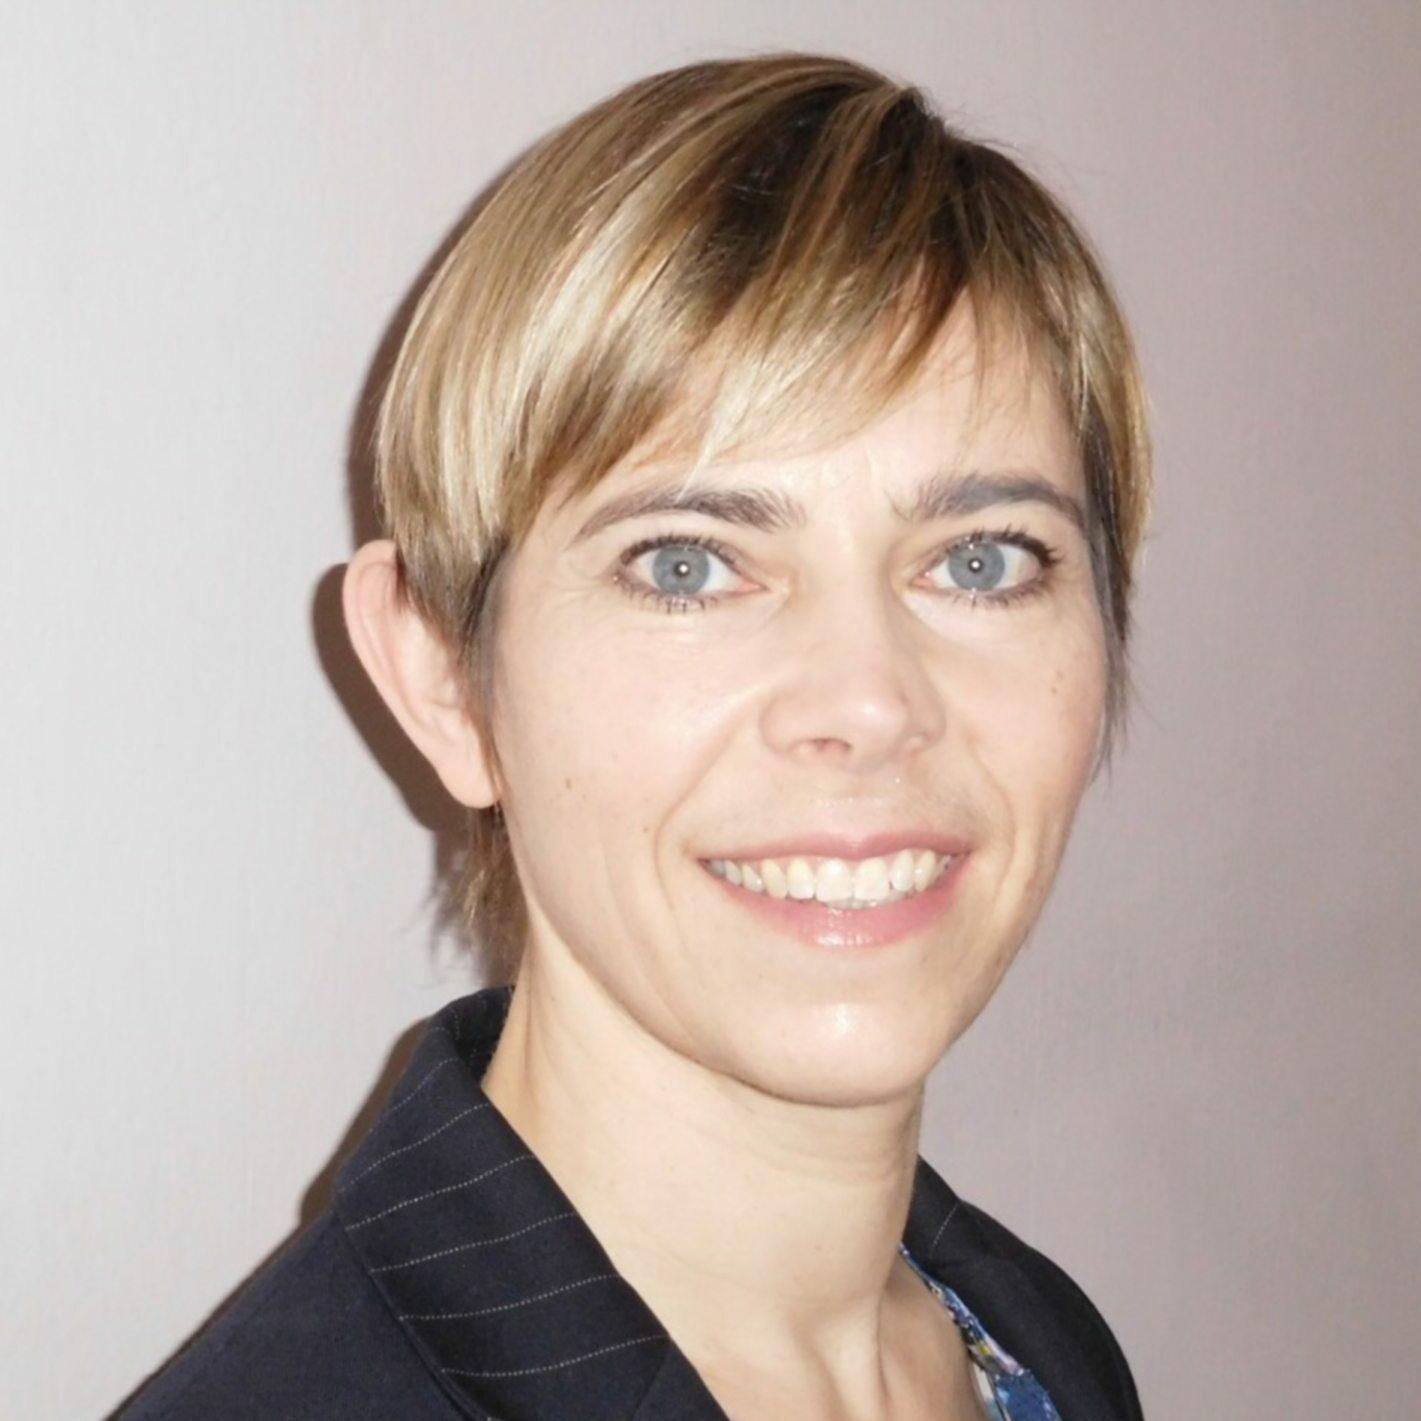 Alison Douglas, the chief executive of Alcohol Focus Scotland.